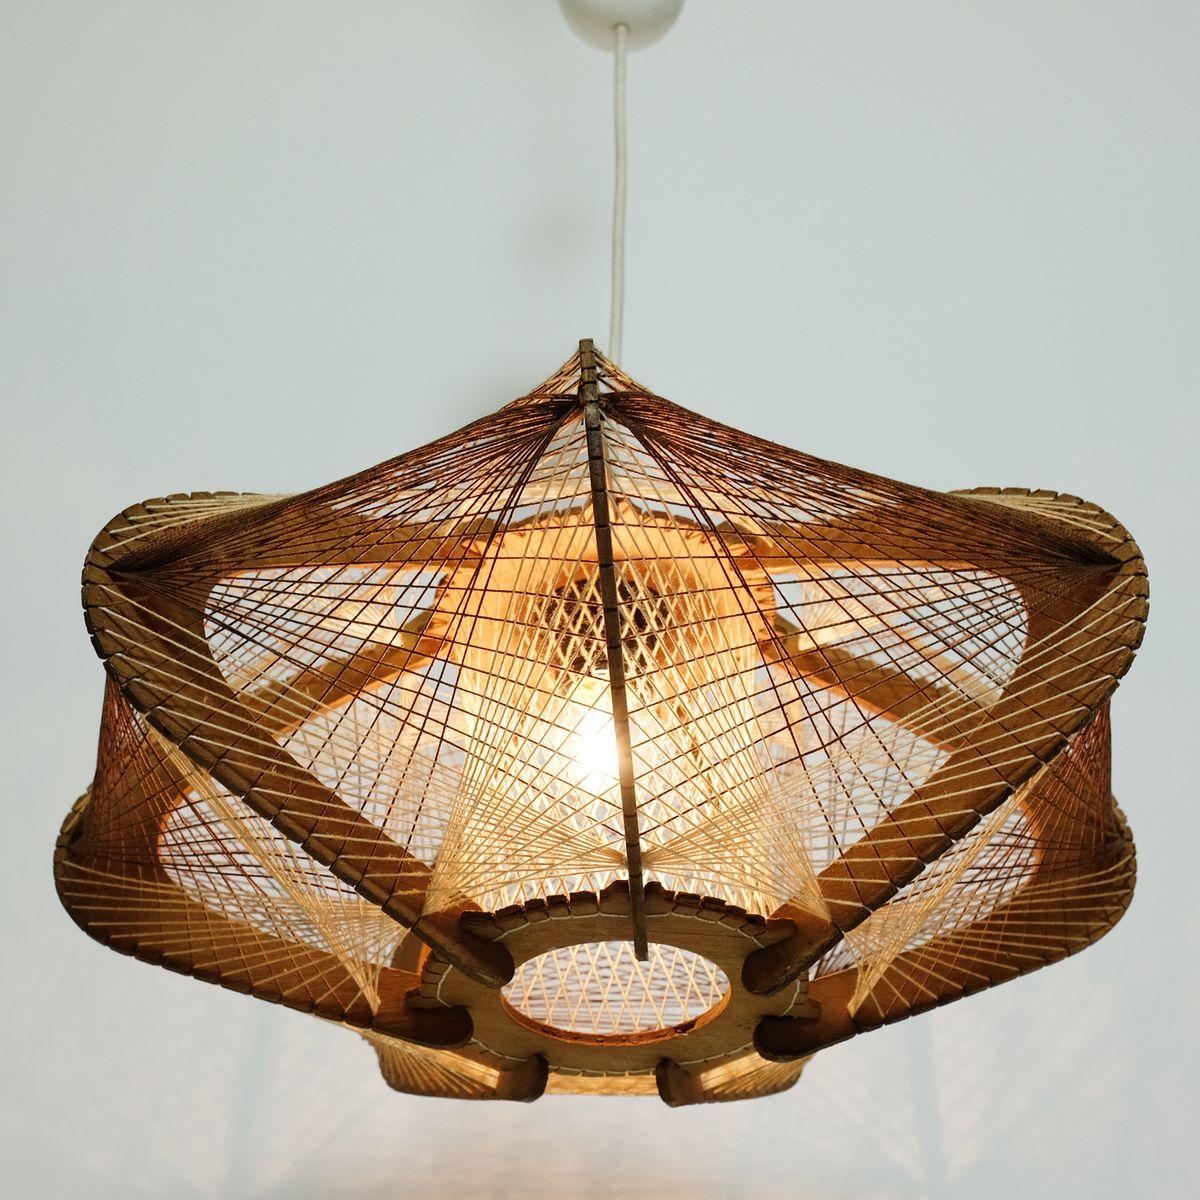 Cordelette1960s En Suspension Lampe À Boisamp; 2HWDIE9Y